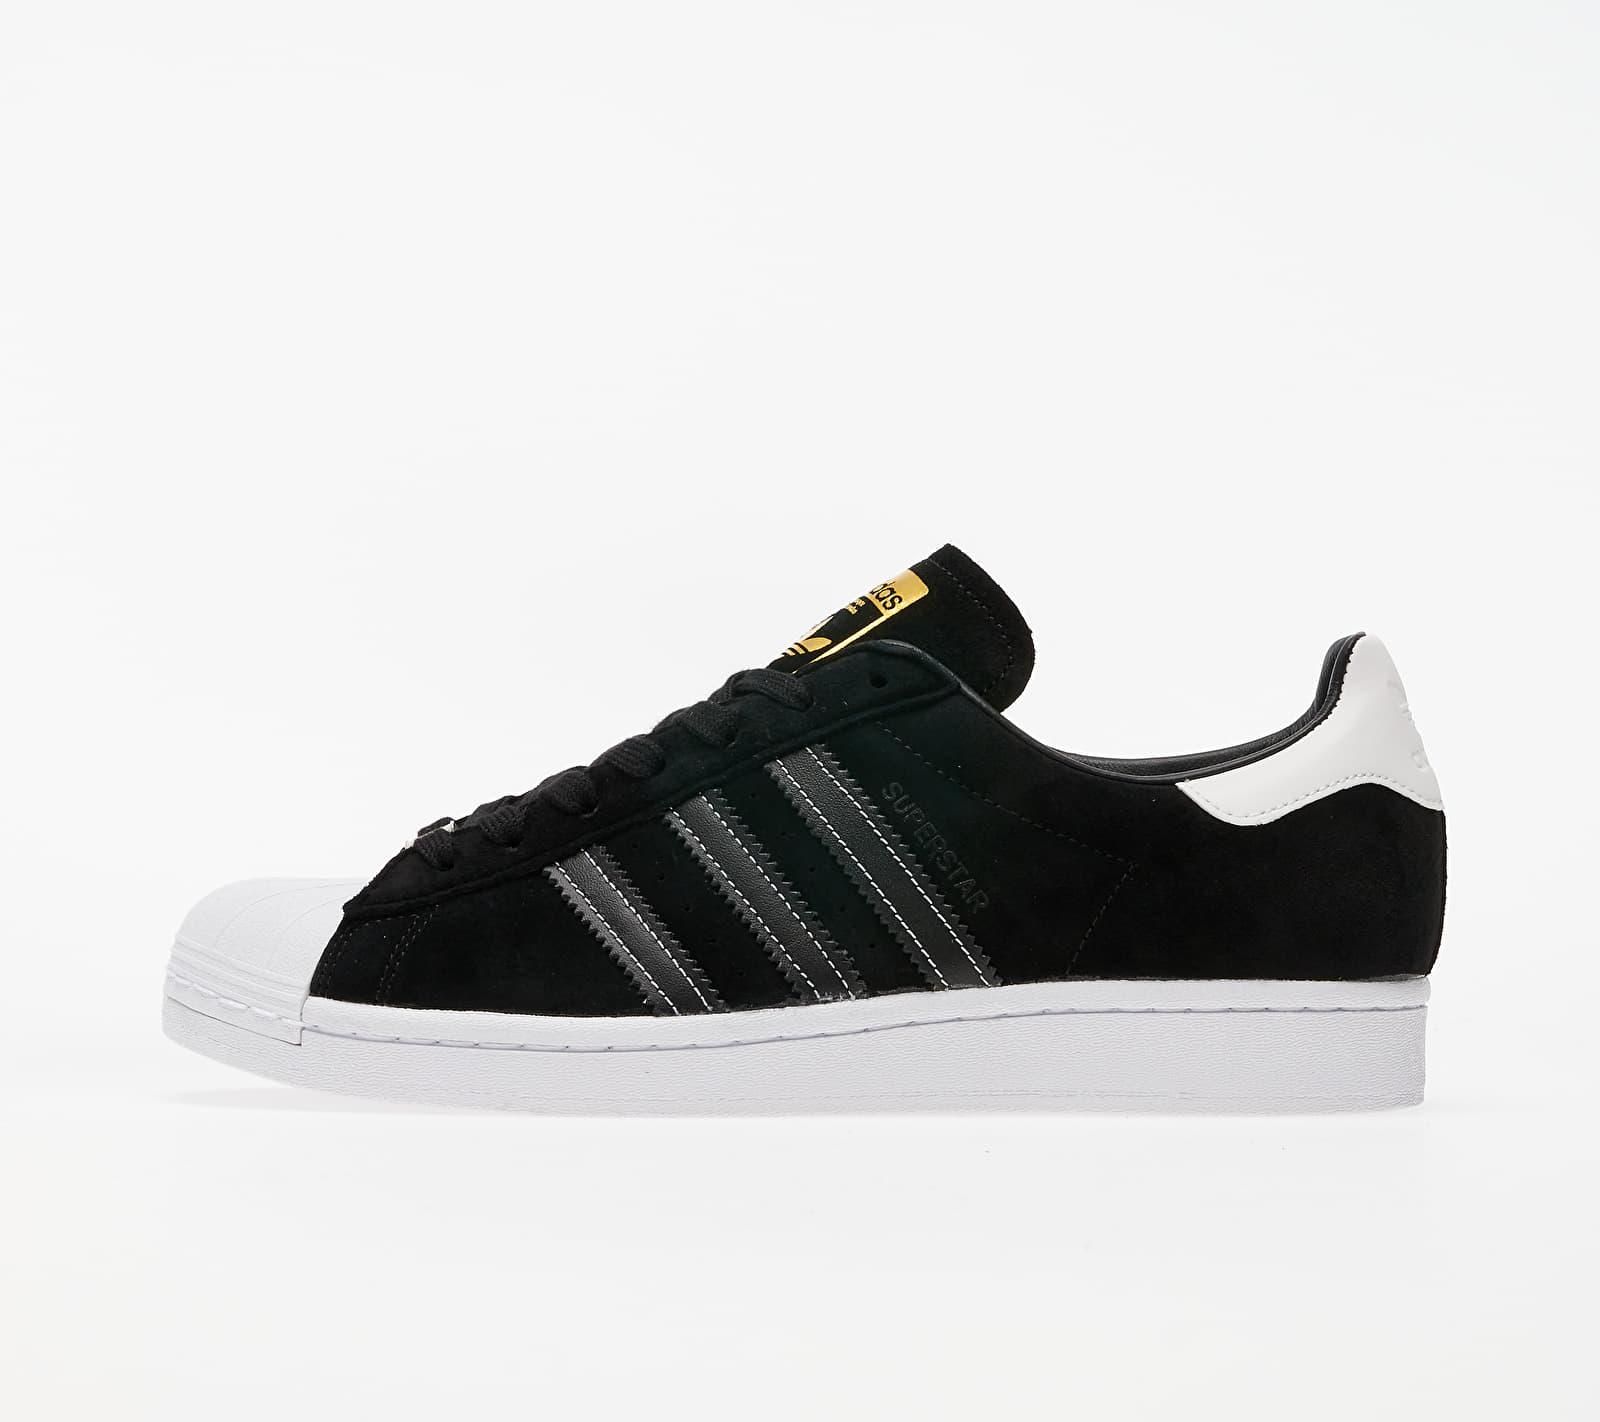 adidas Superstar Core Black/ Core Black/ Gold Metalic EH1543